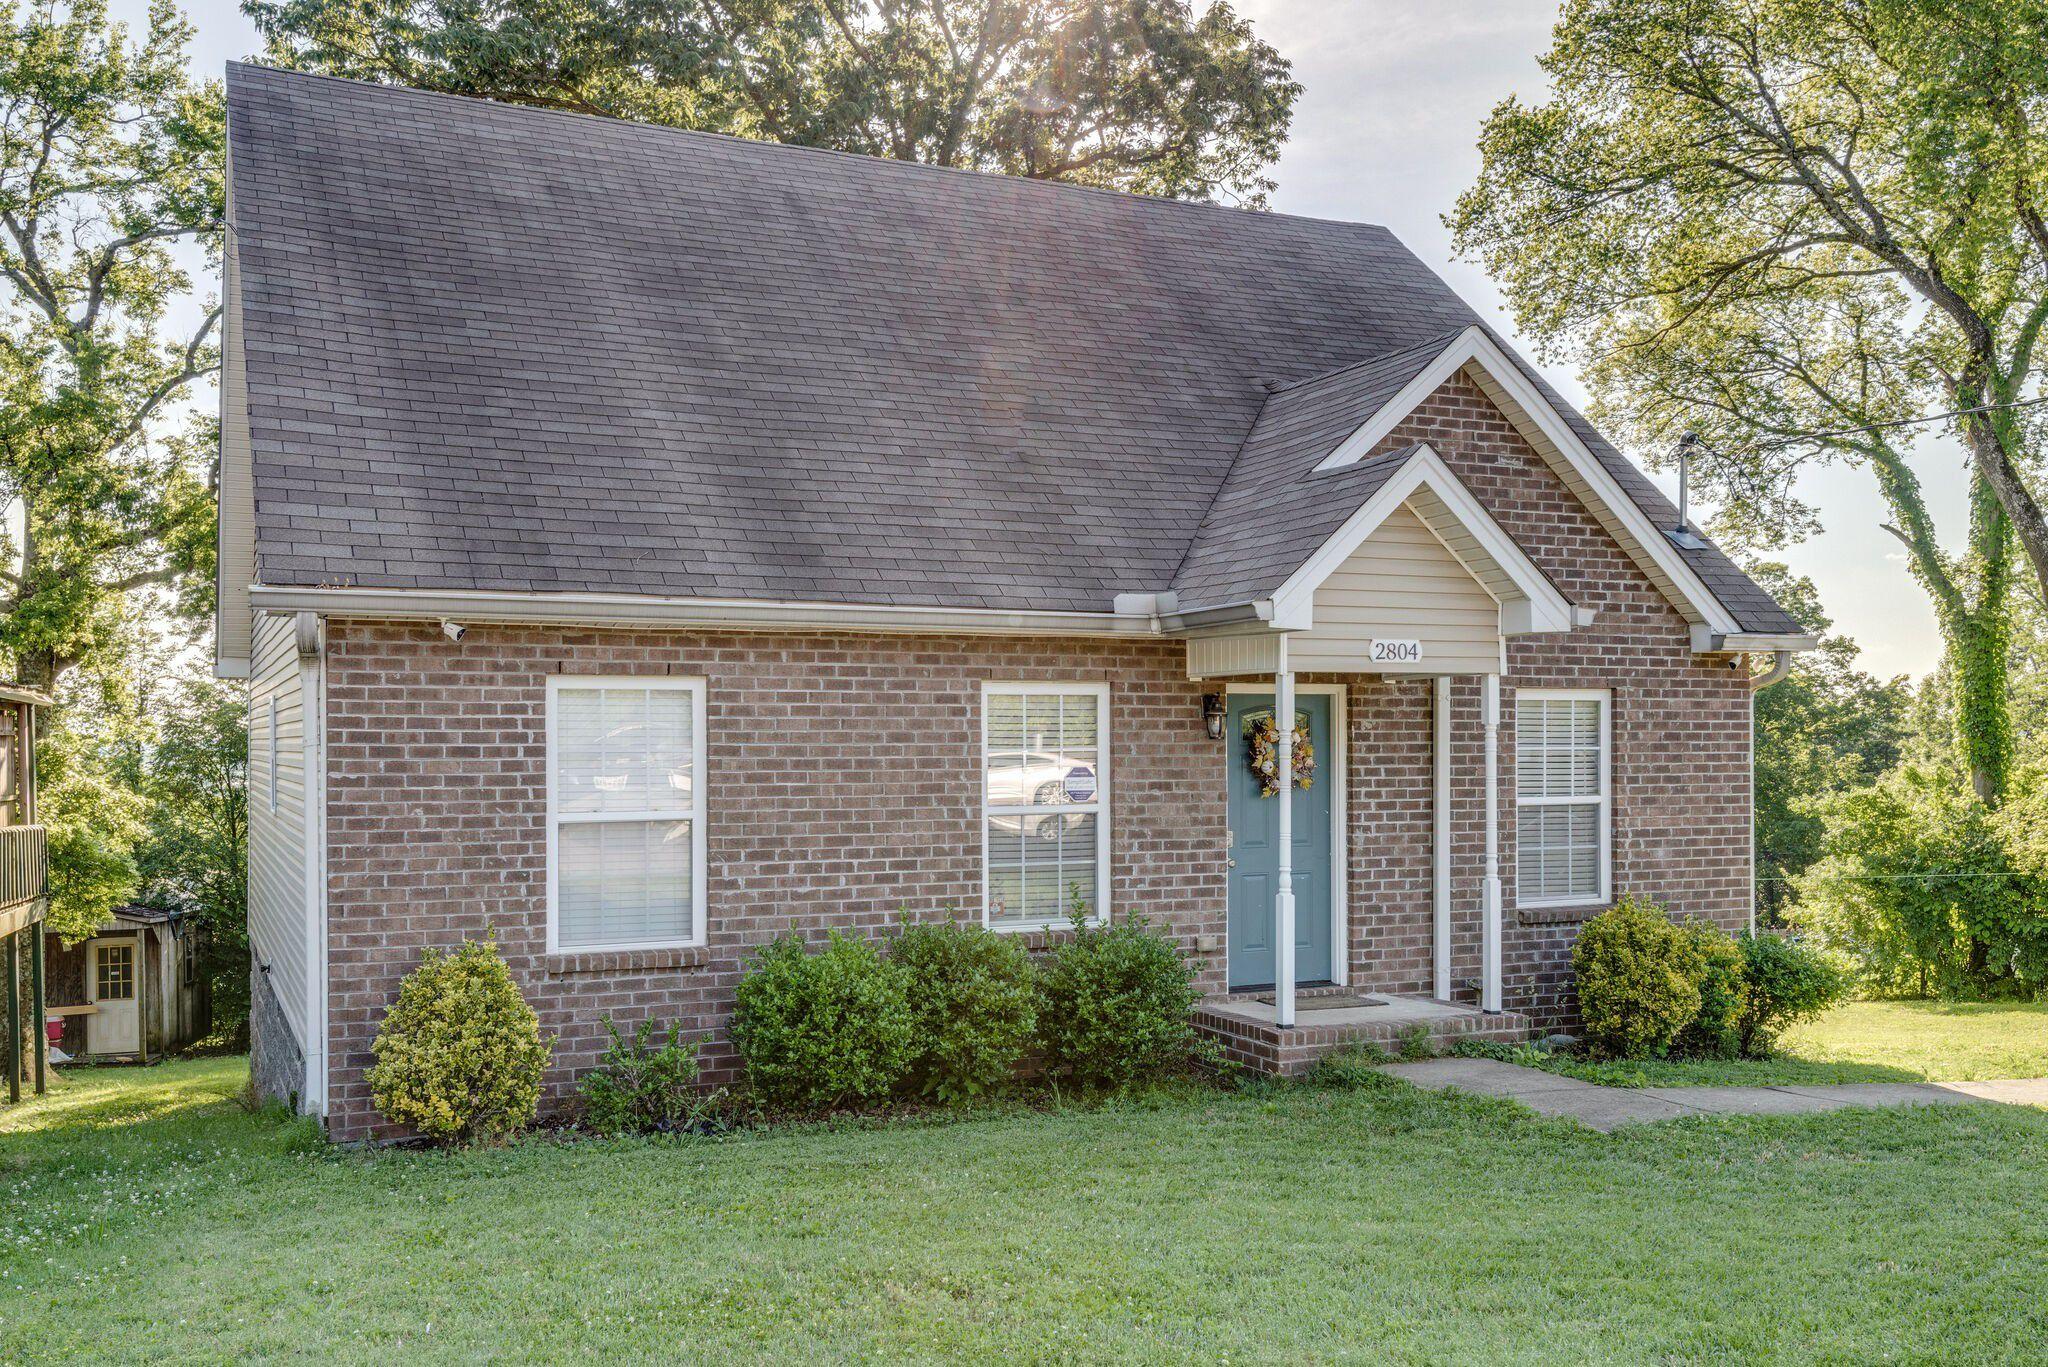 Shepardwood Homes For Sale In Nashville Tn